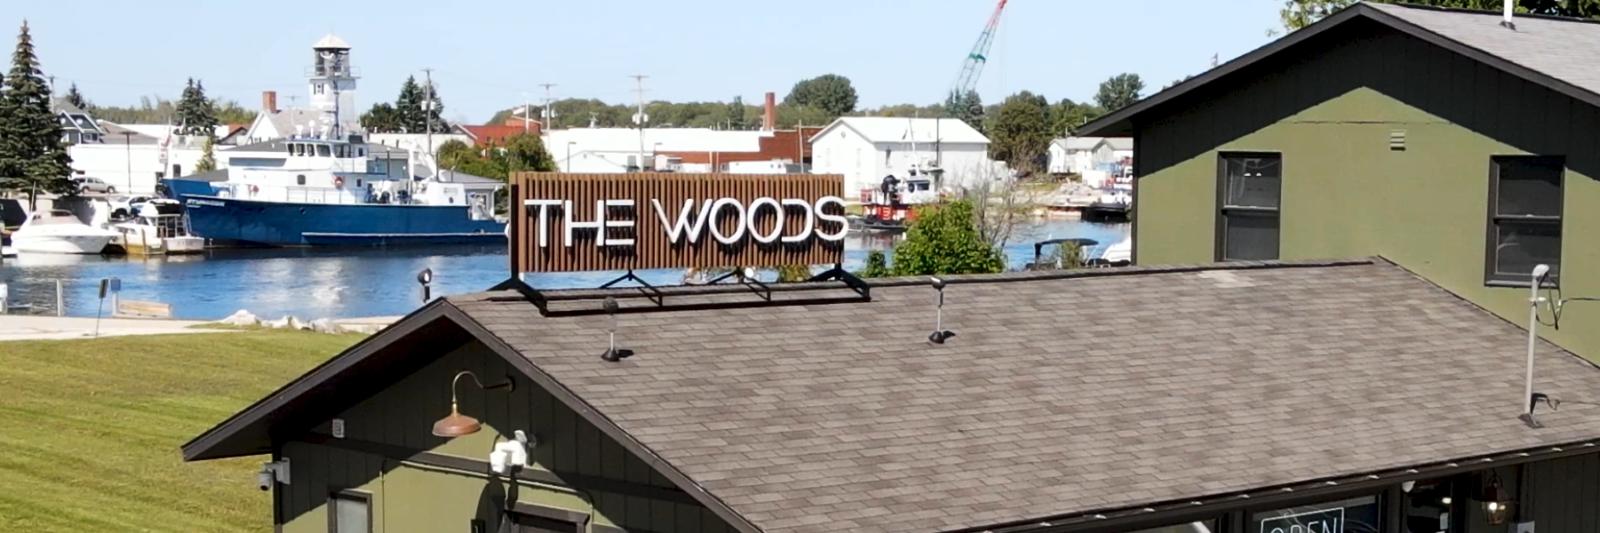 The Woods Cheboygan Banner